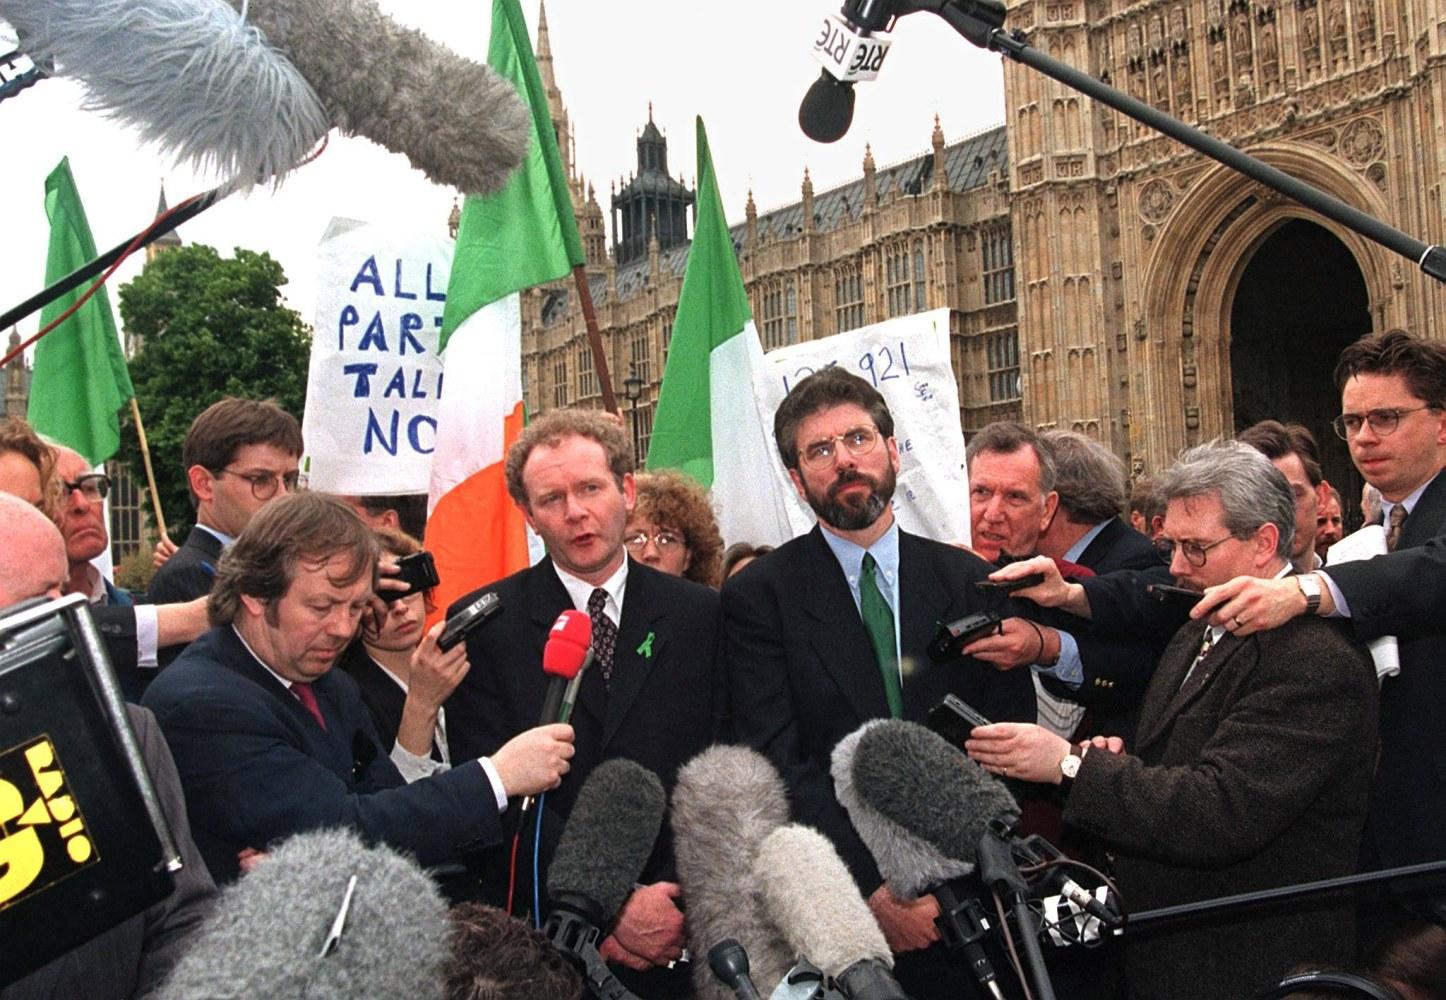 Image Newly elected Sinn Fein MPs Gerry Adams